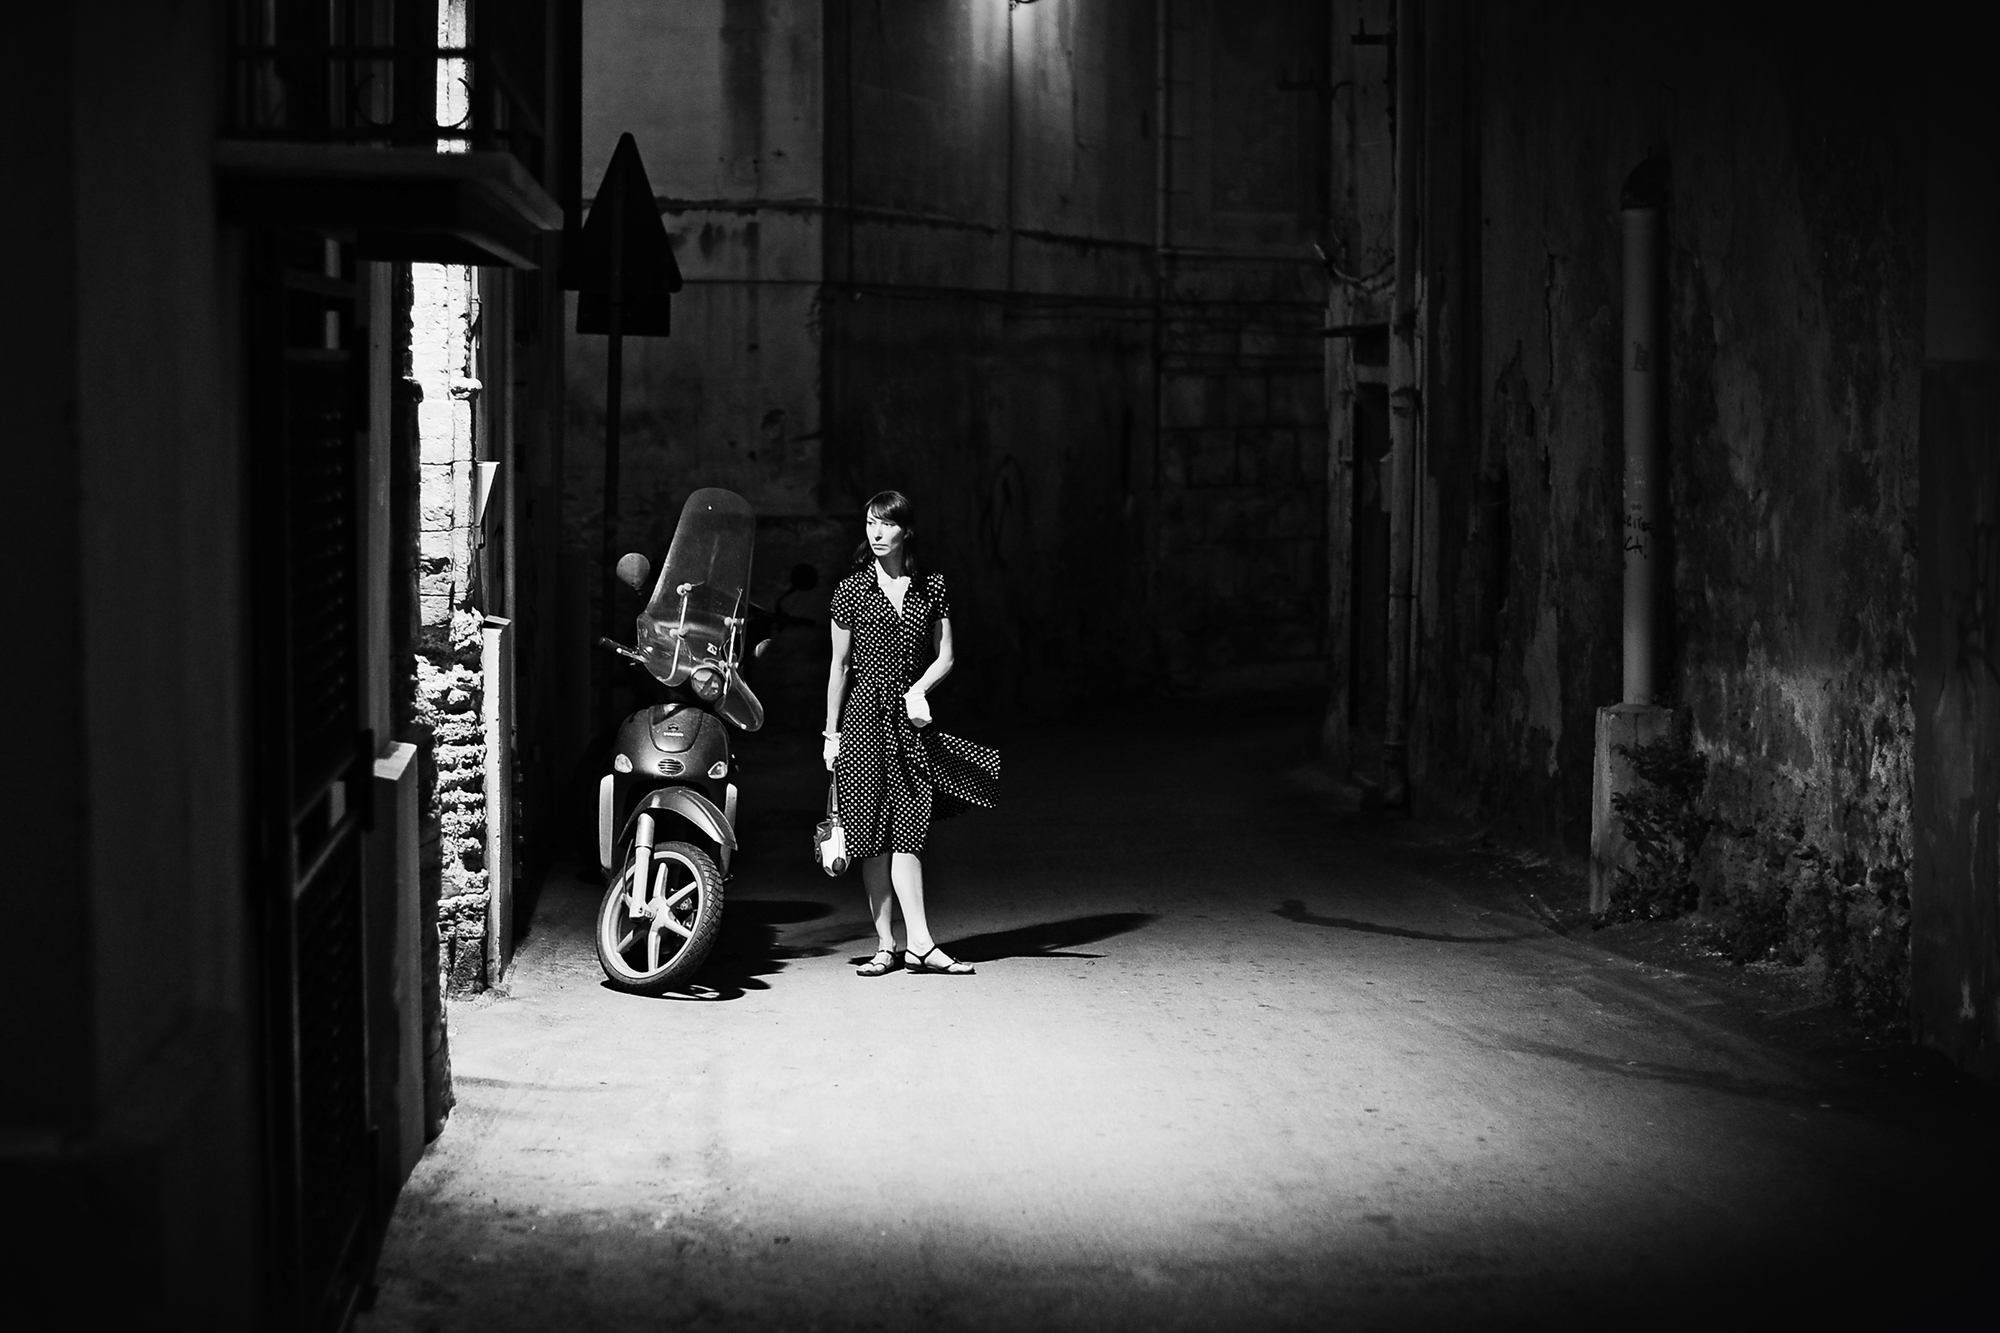 Lina_Ruskyte-Lukoseviciene_monochrome_May_LT_16